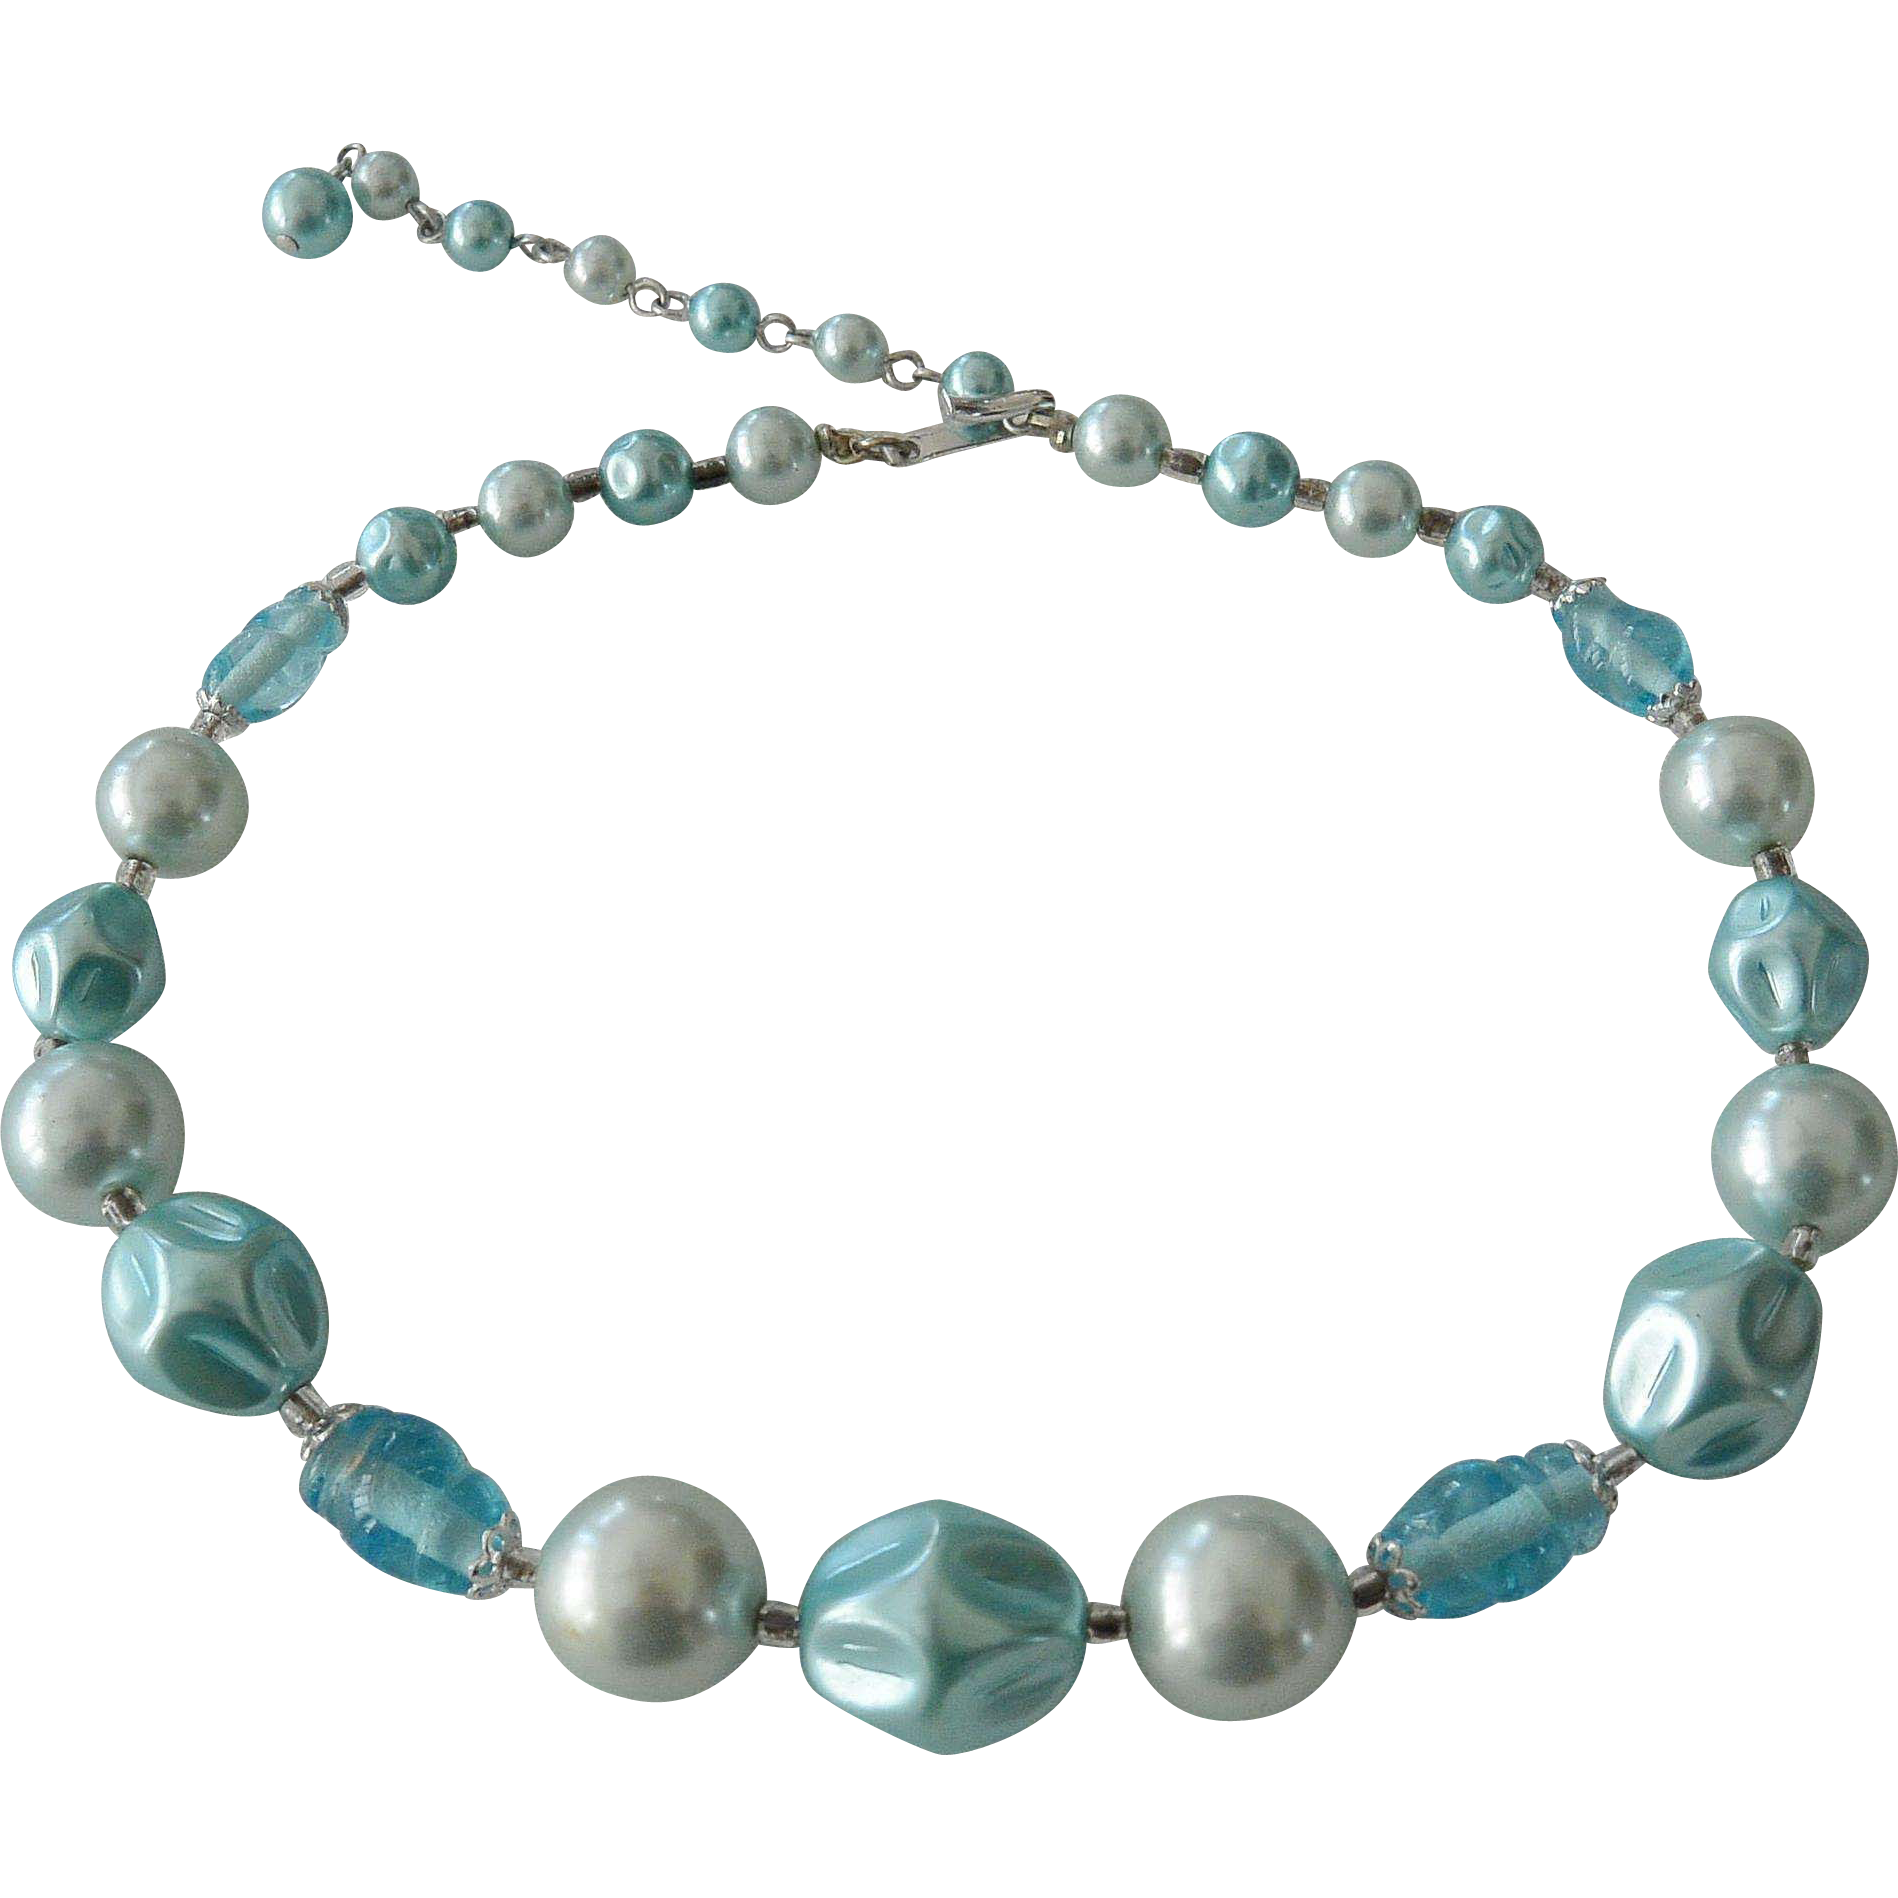 Japan Blue Faux Pearls Necklace